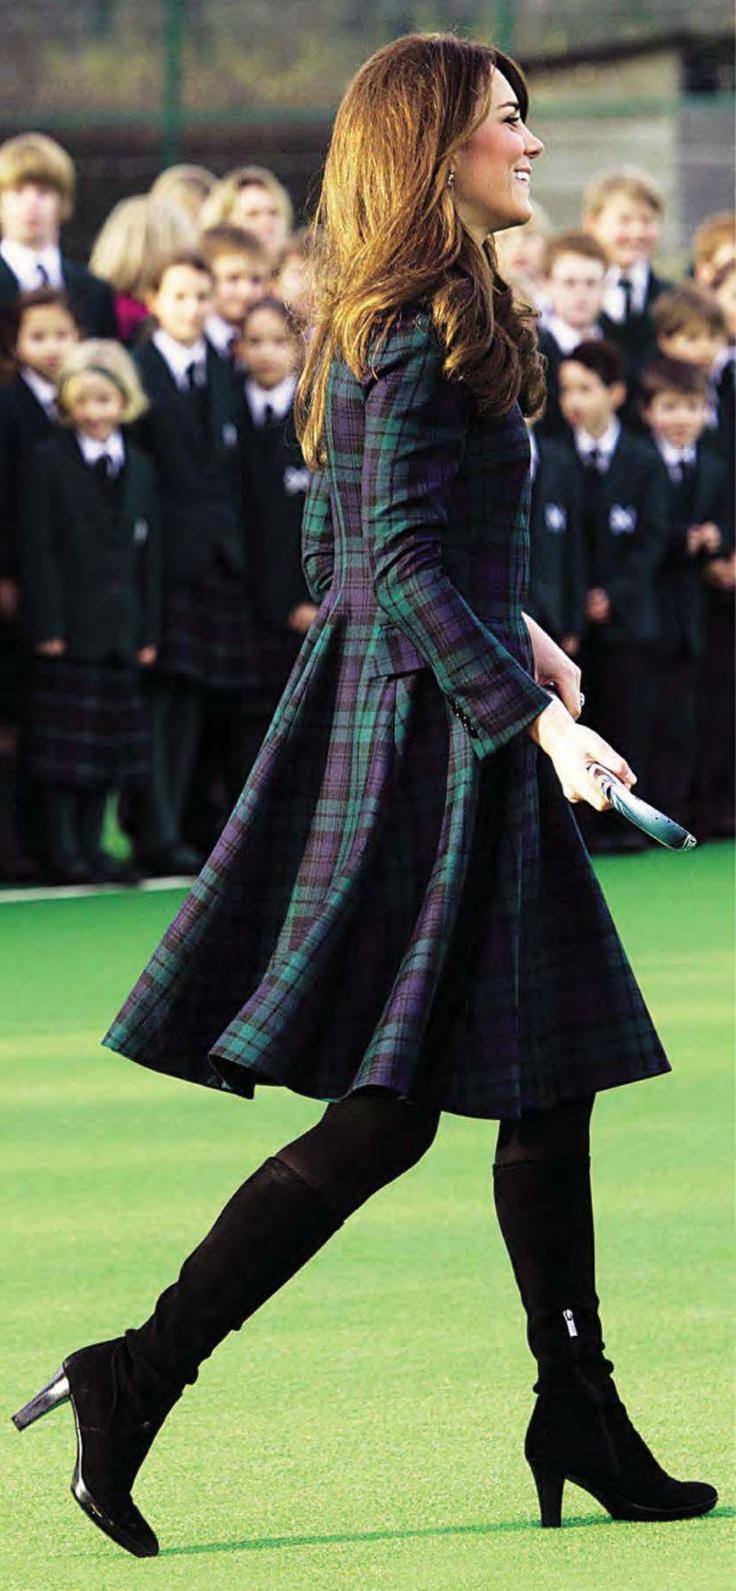 206 best Tartan images on Pinterest | Scotland, Ireland and Scotland ...